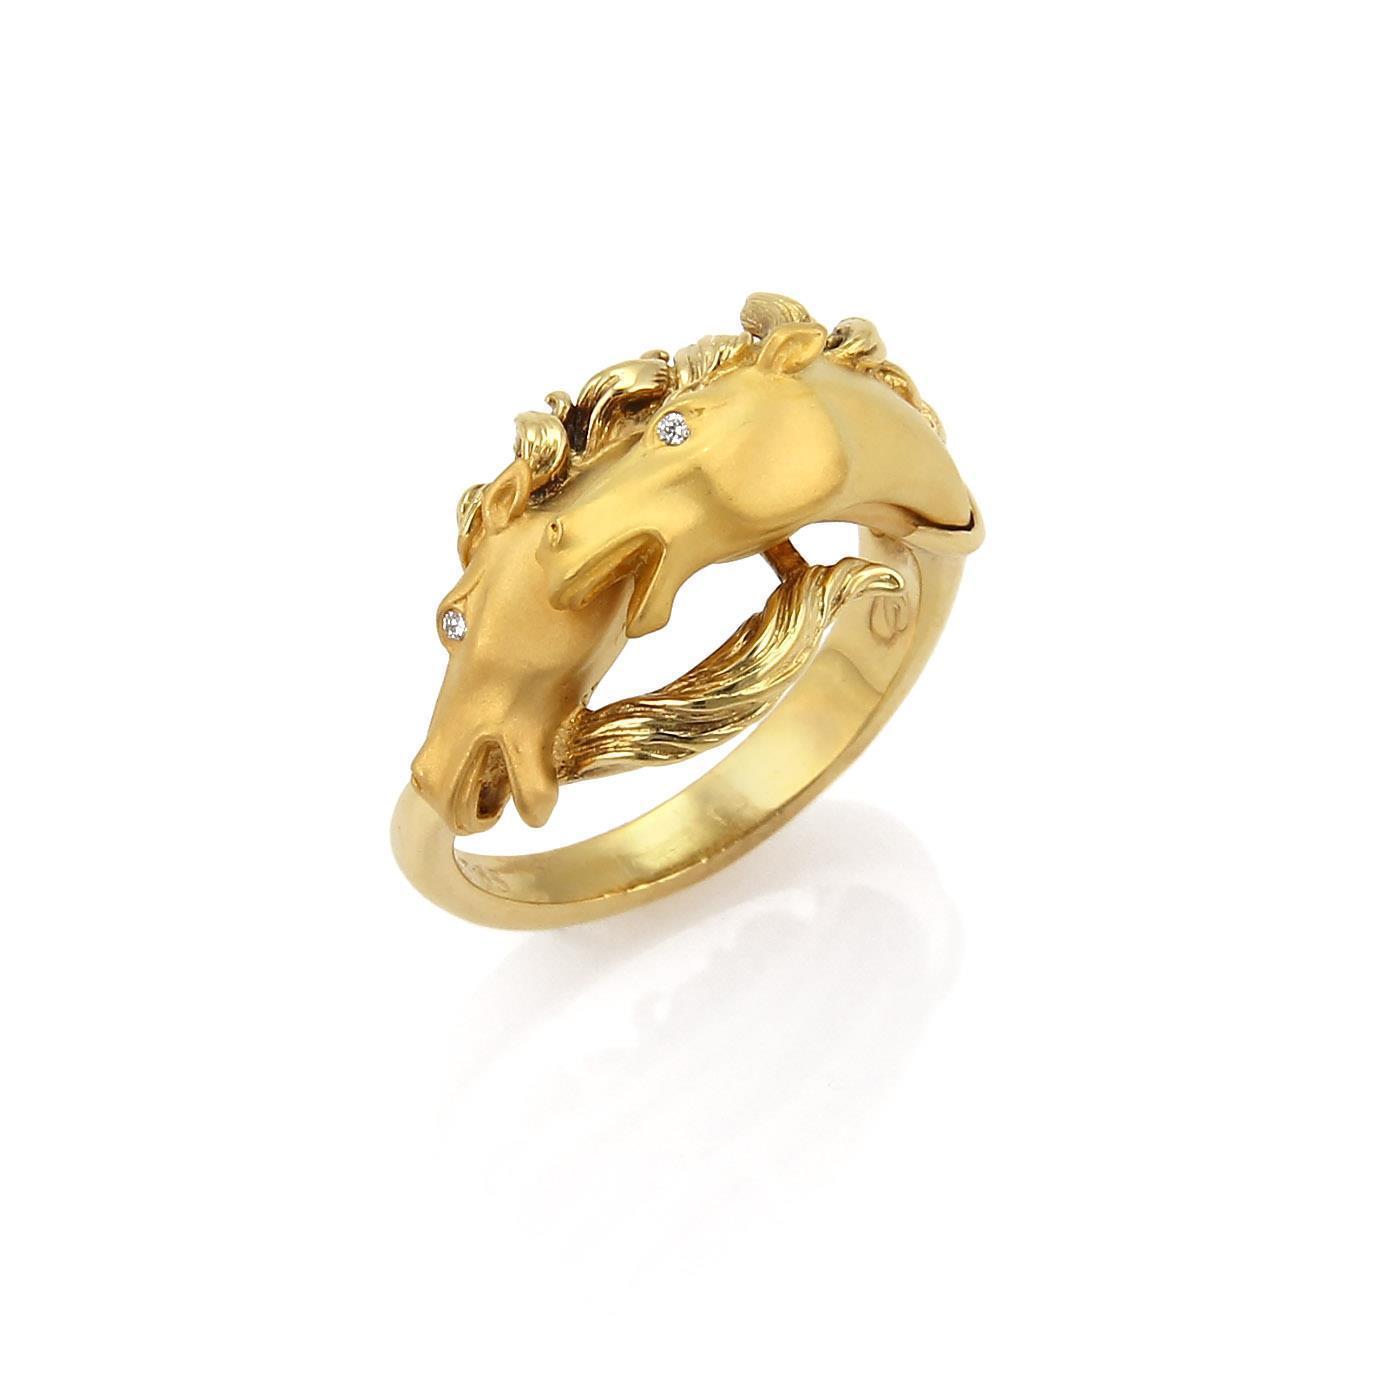 "Image of ""Carrera Y Carrera 18K Yellow Gold Diamond 2 Horse Head Ring Size 6.5"""